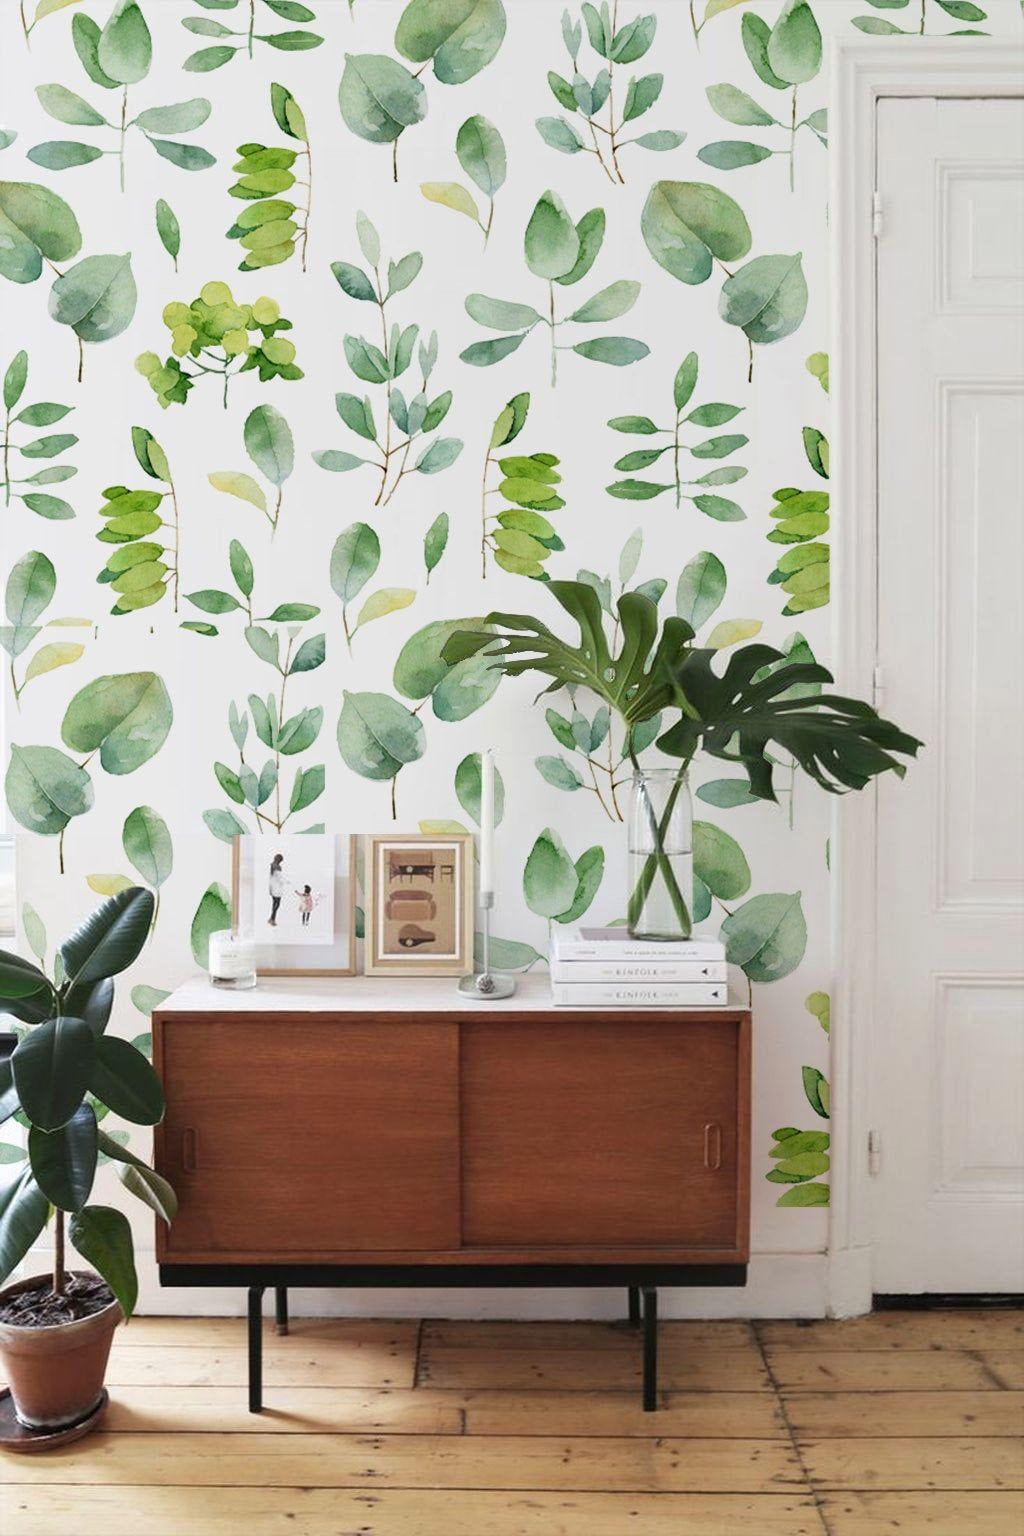 Watercolor Botanical Peel And Stick Wallpaper Greenery Etsy Wall Murals Diy Greenery Wallpaper Wall Wallpaper